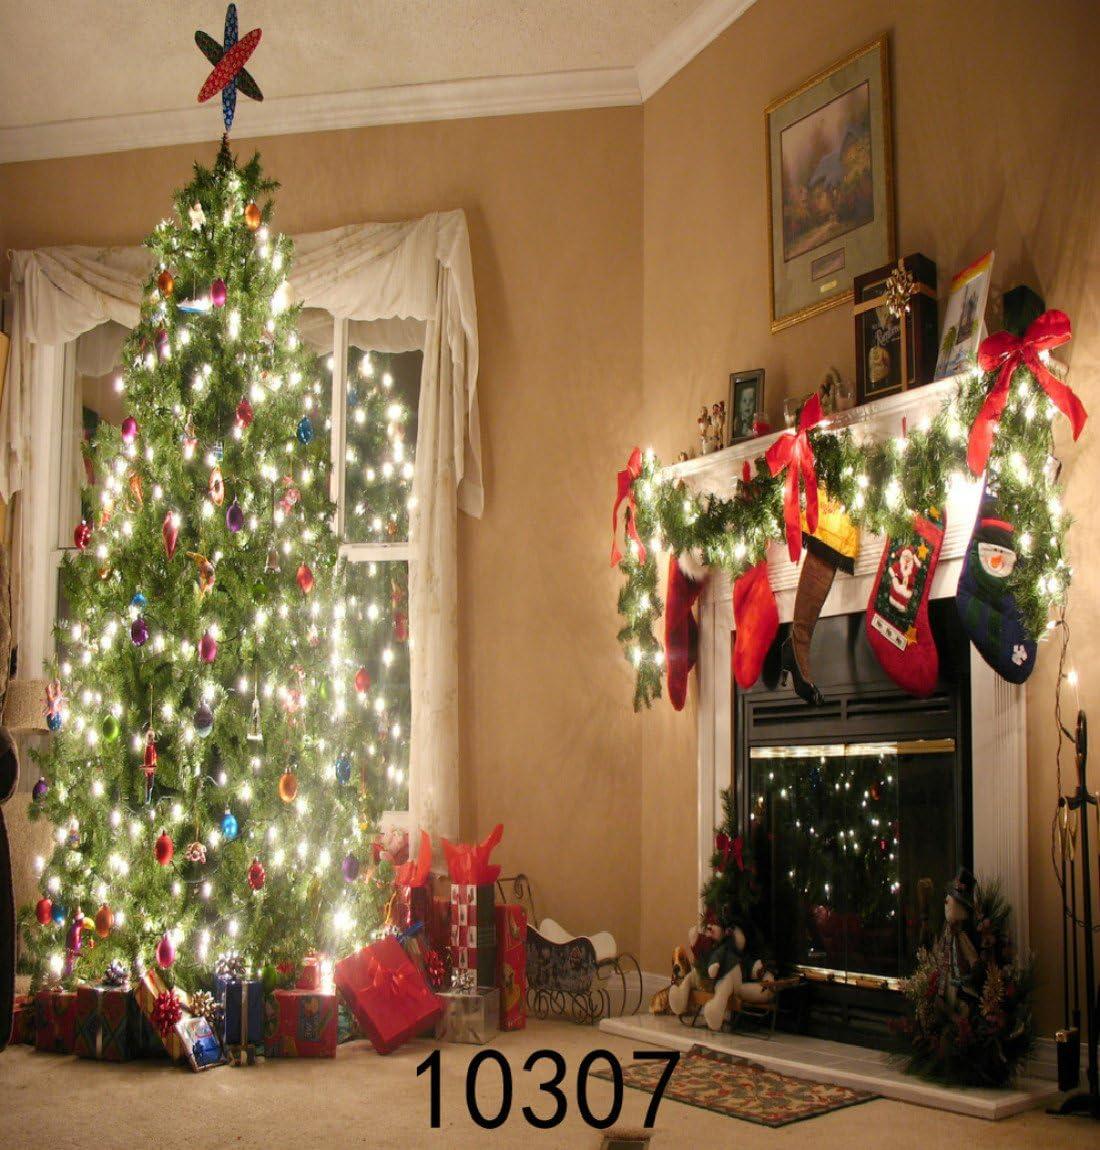 6X10FT-Christmas Tree Photography Backdrops Festival Decoration Photo Studio Background